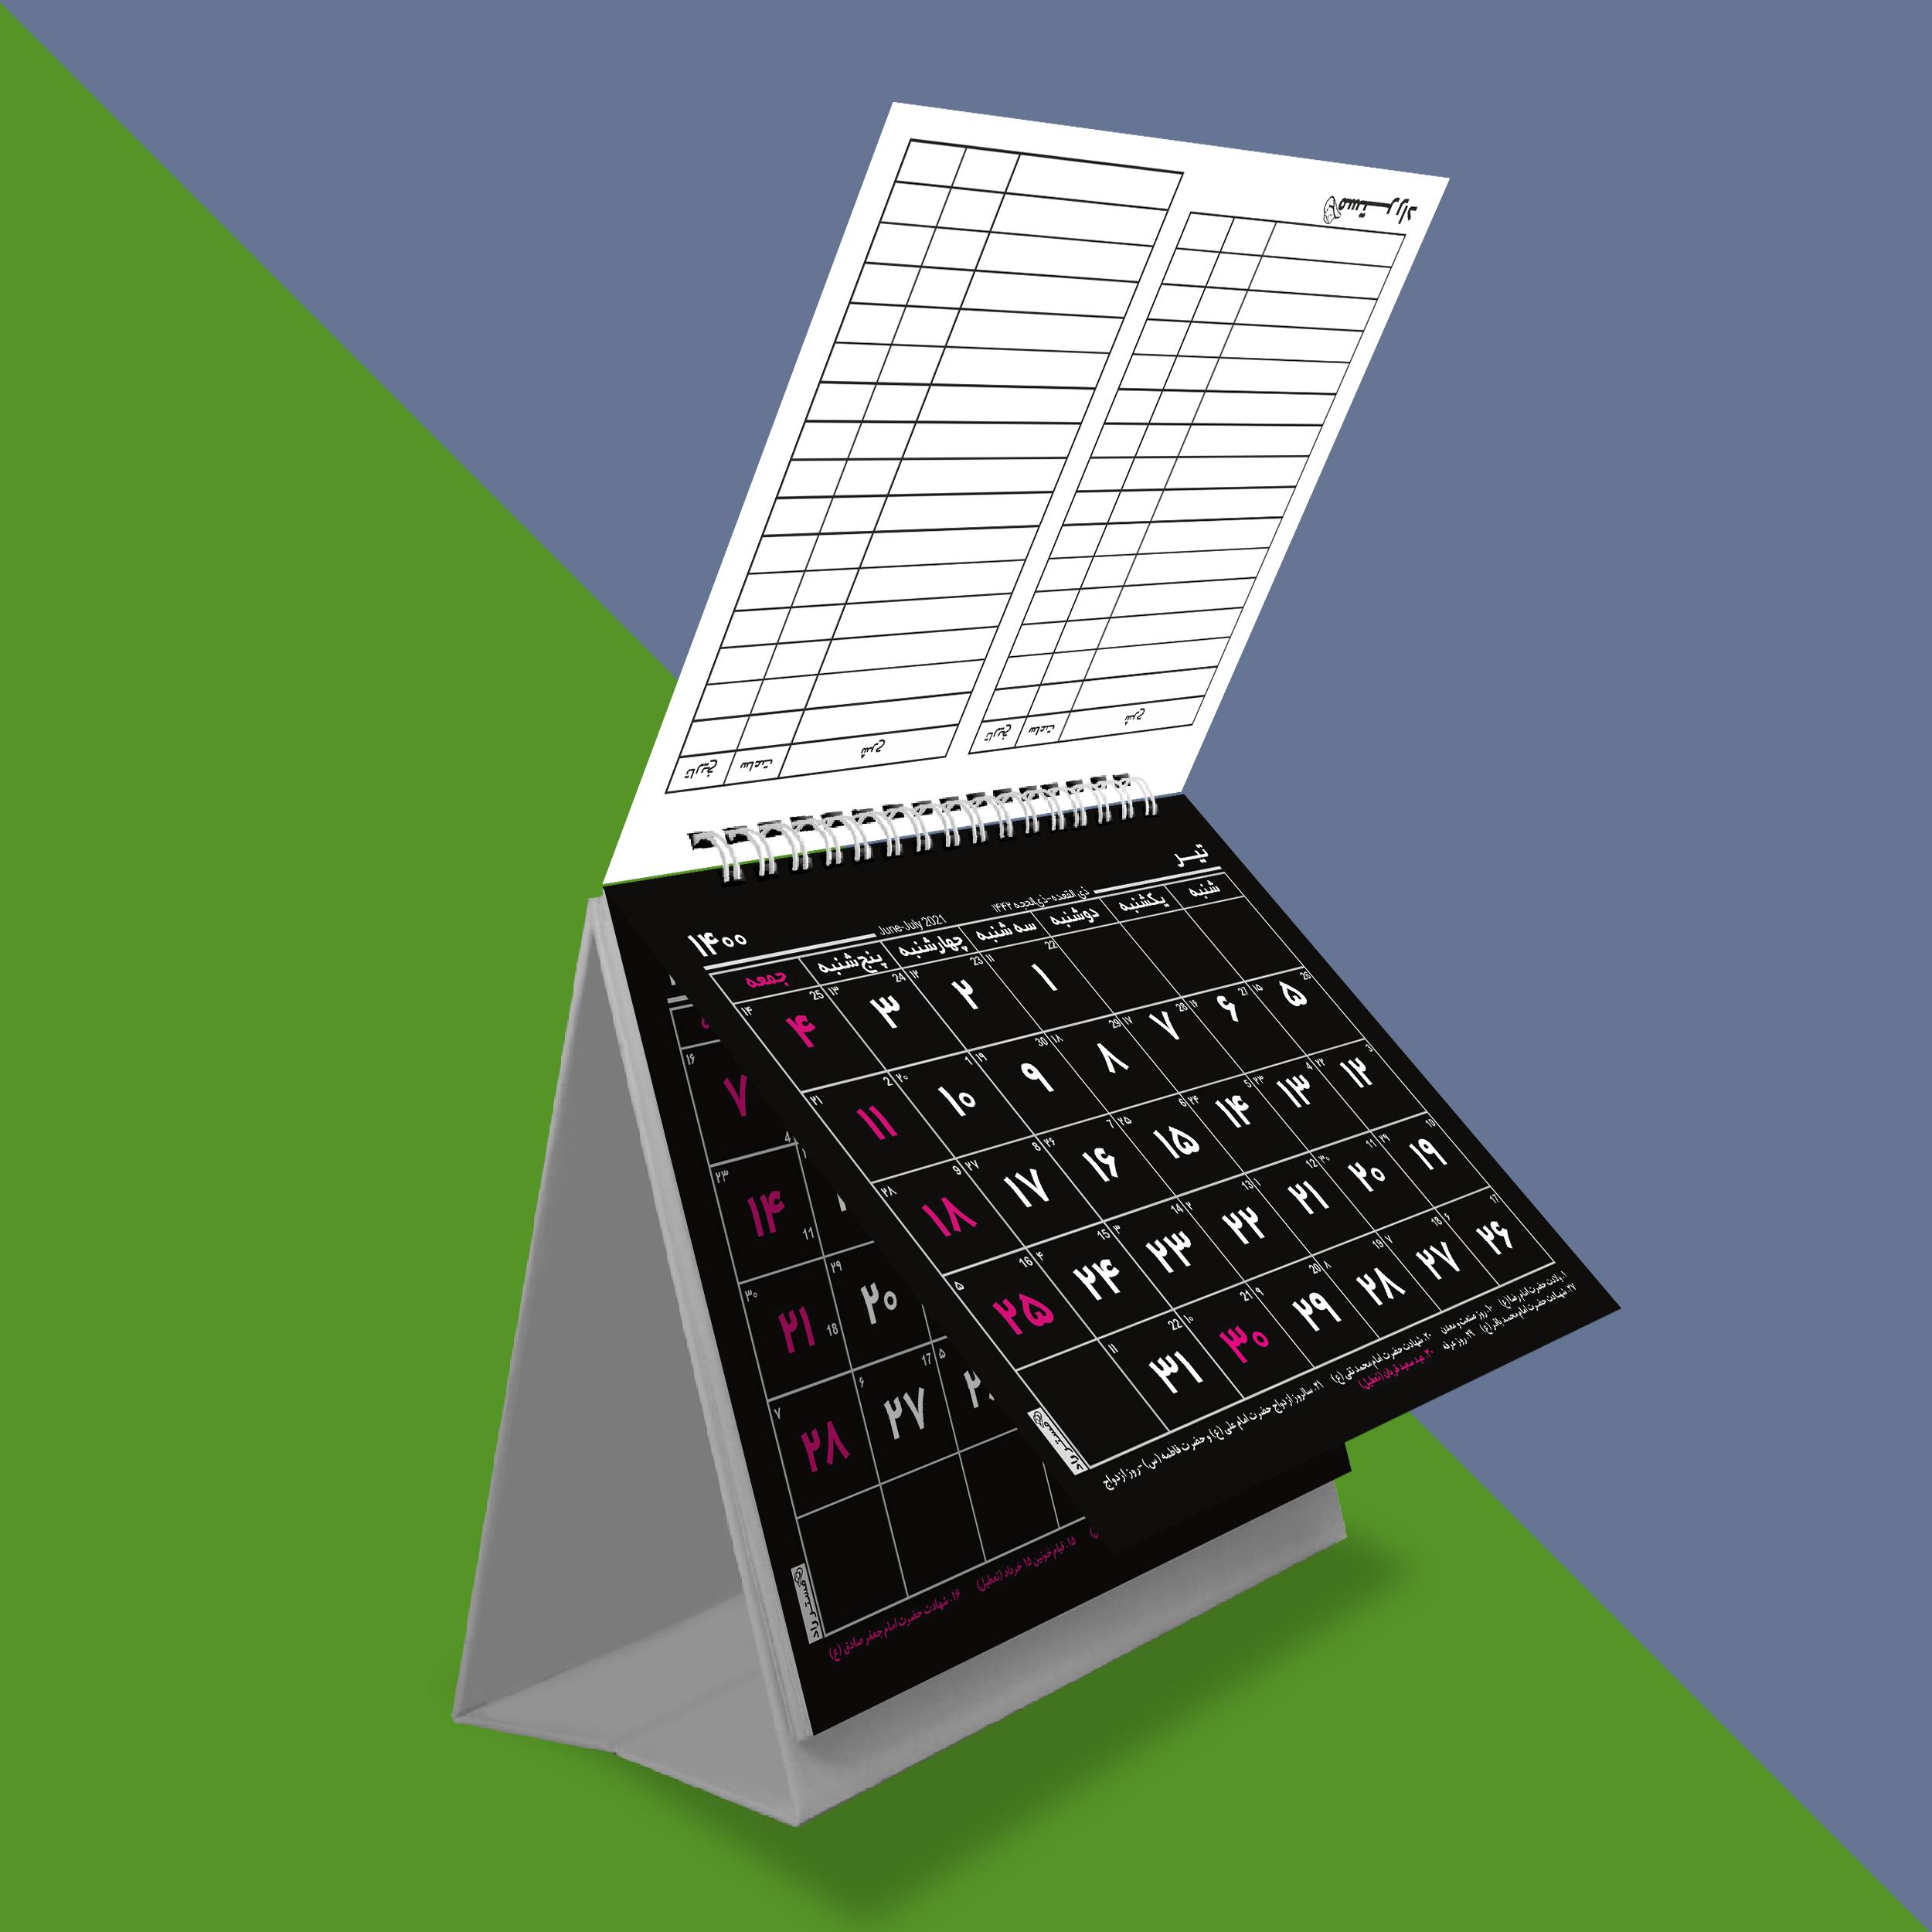 تقویم رومیزیسال 1400  مستر راد مدل endar 2021 کد s20 thumb 4